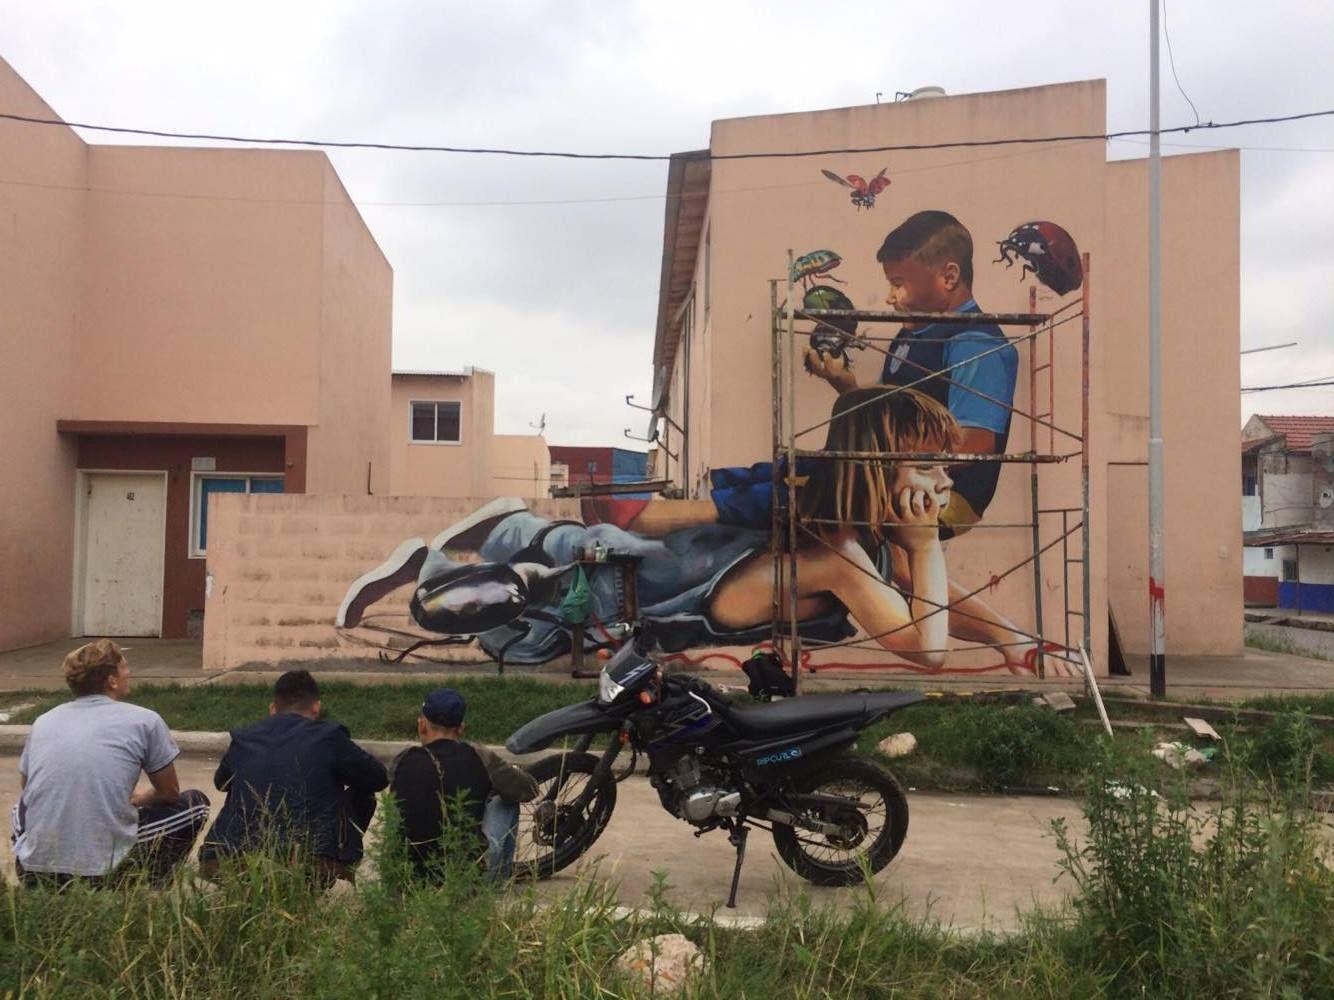 Adrian Takano Street Art